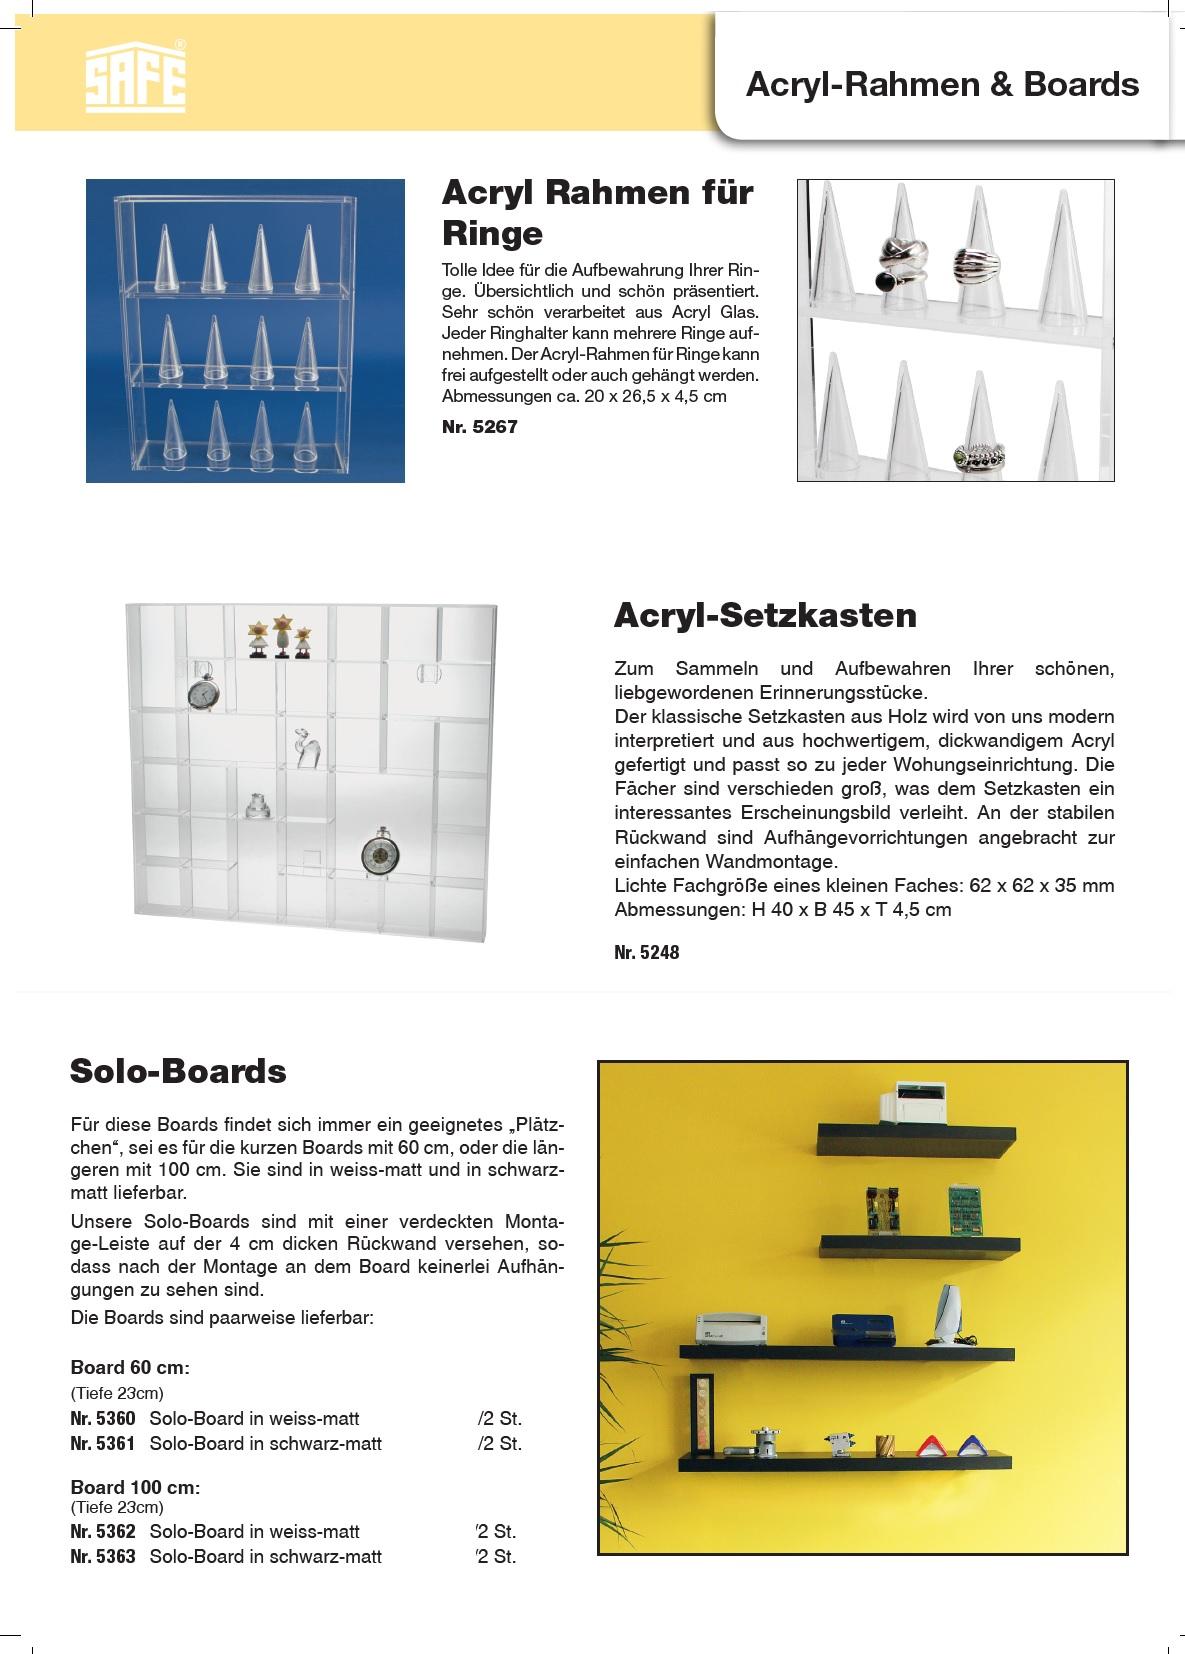 SAFE 5243 Beleuchtete Acrylglas Präsentations Vitrinenwürfel Deko ...